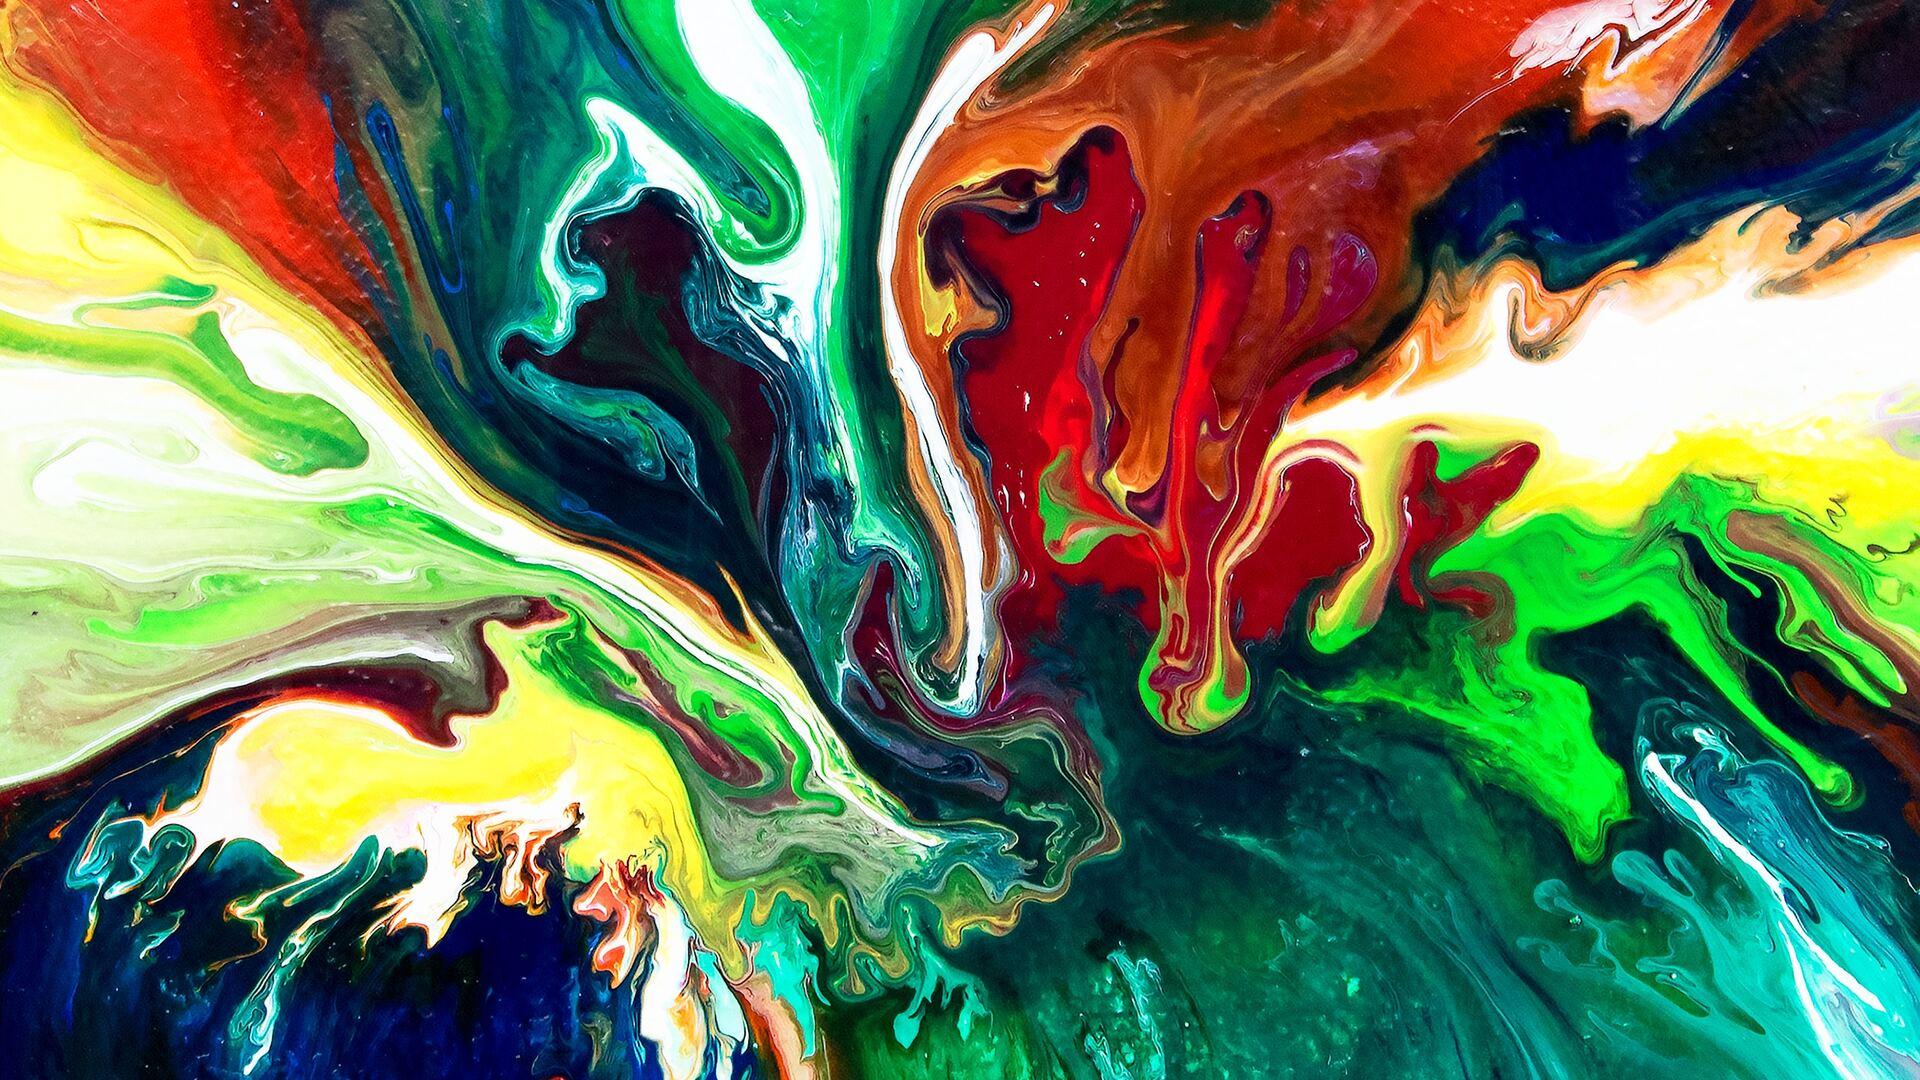 1920x1080 Abstract Paint Swirl Laptop Full HD 1080P HD 4k ...